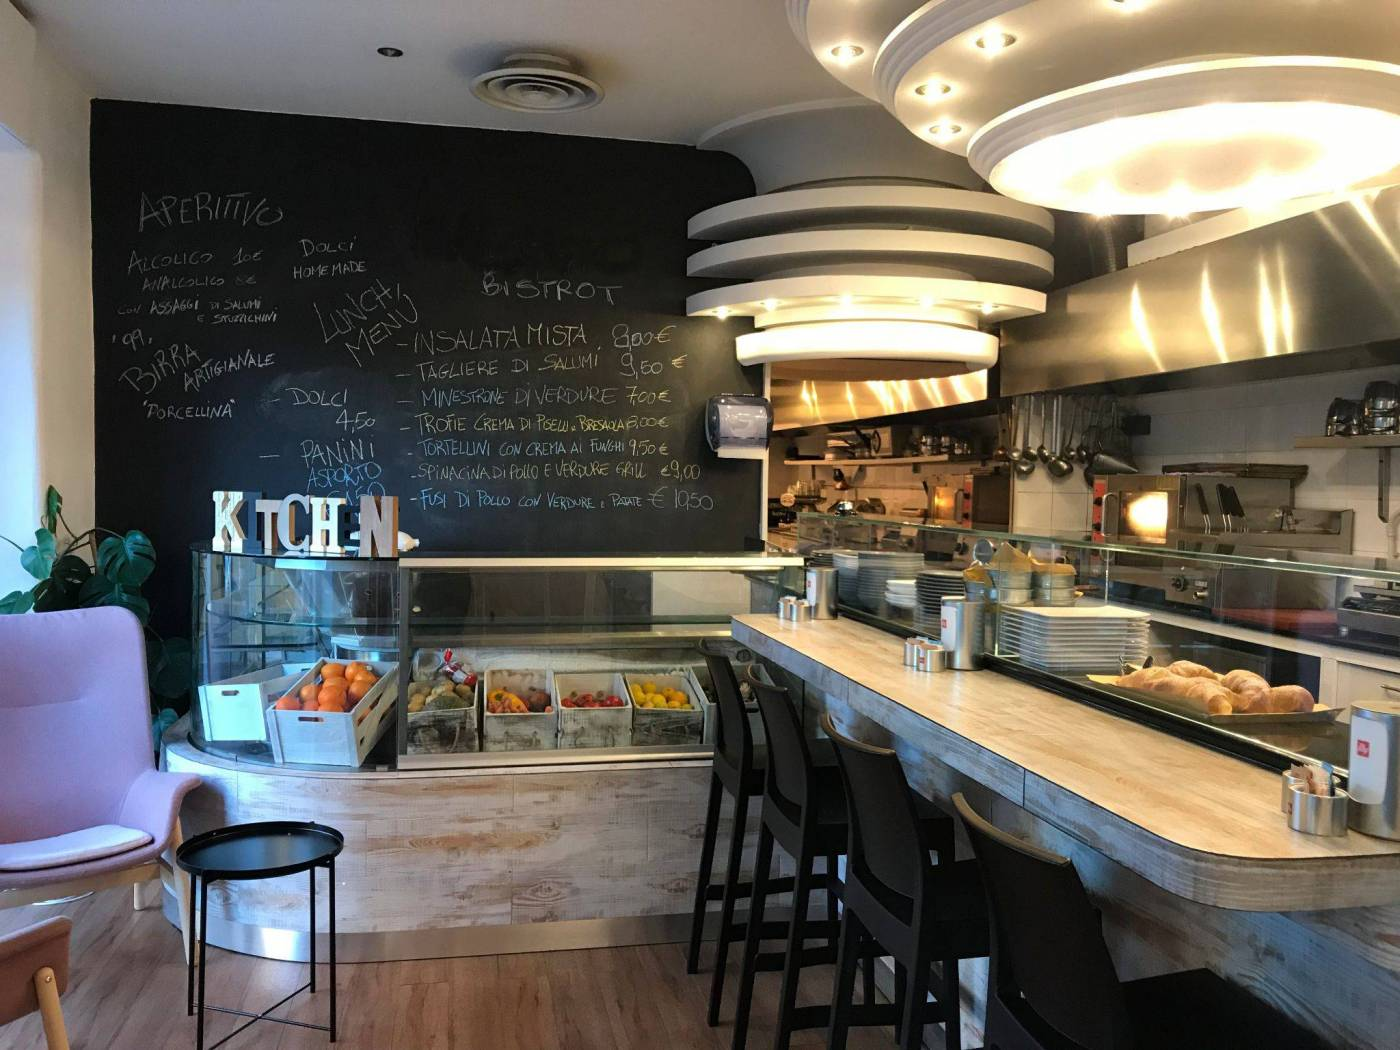 PAGANO – Raffinato ed elegante Bar Tavola fredda con Gastronomia